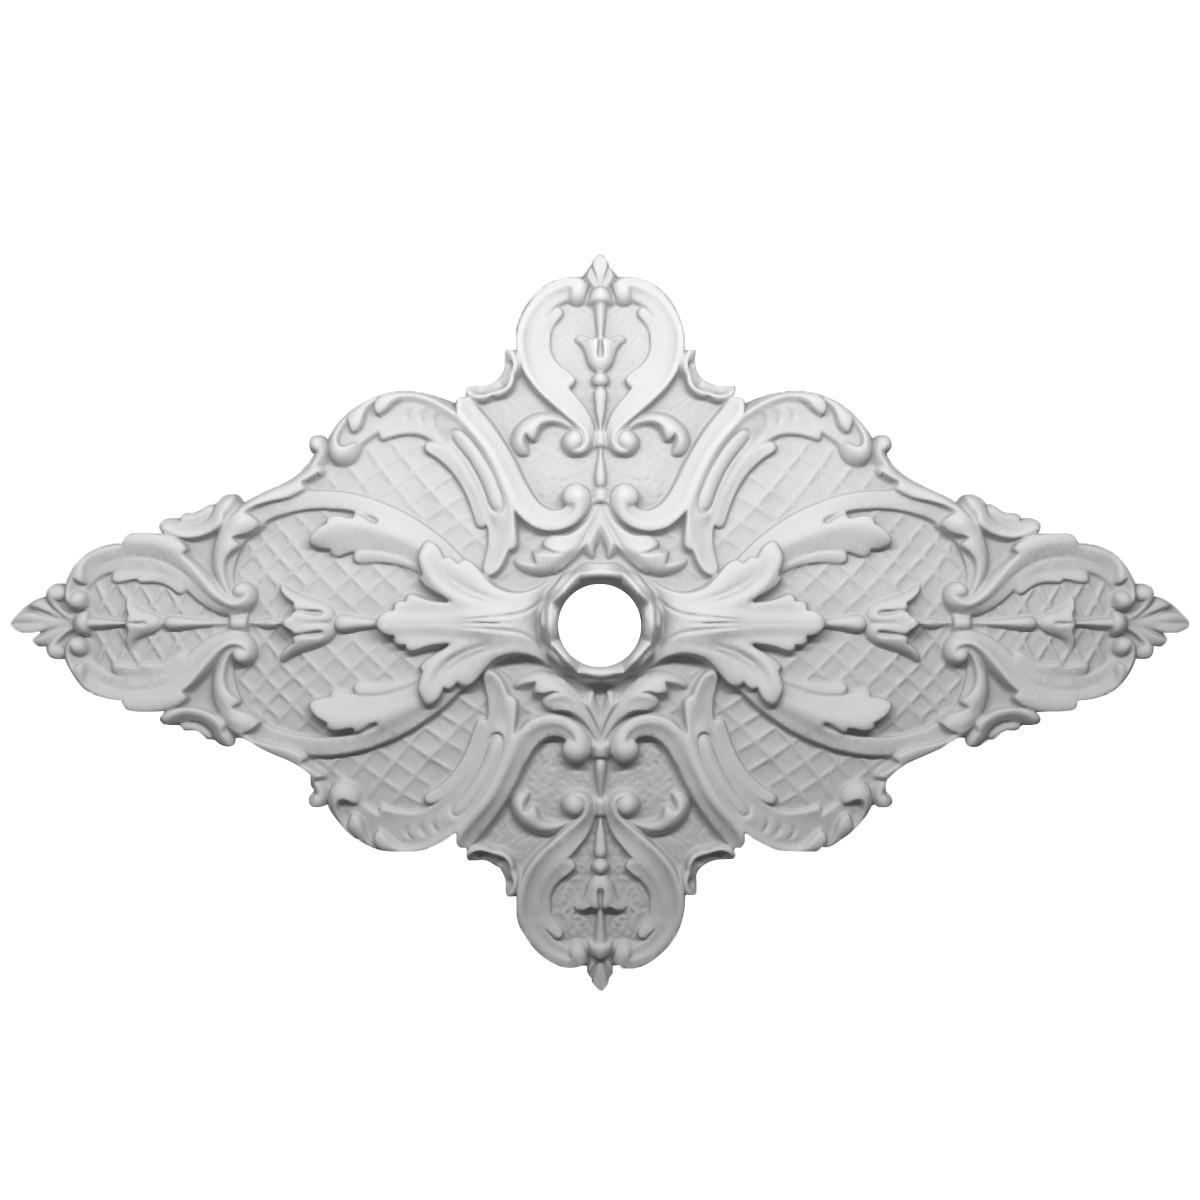 Розетка потолочная из гипса р-9 800х500